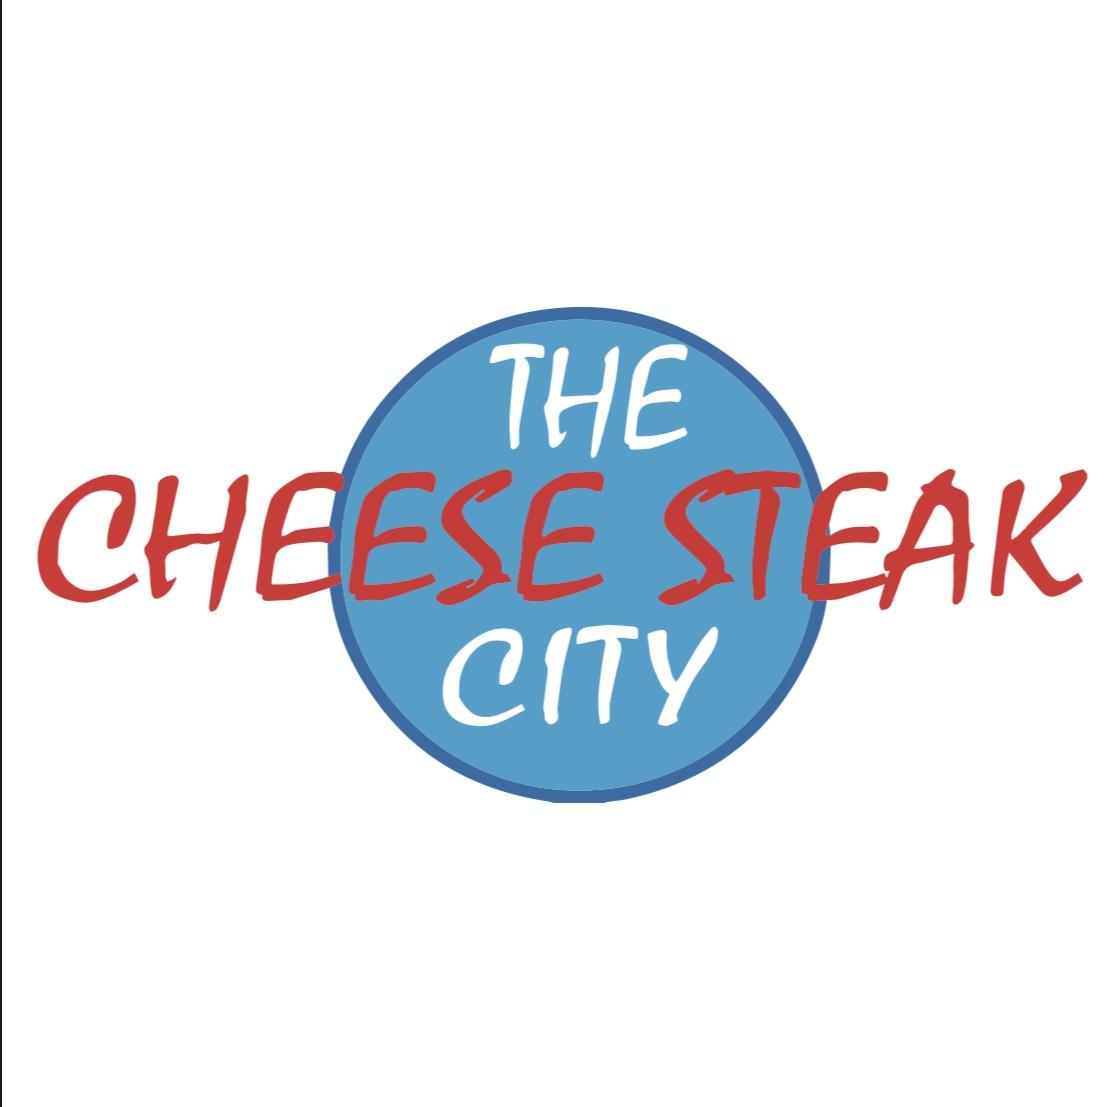 THE CHEESESTEAK CITY